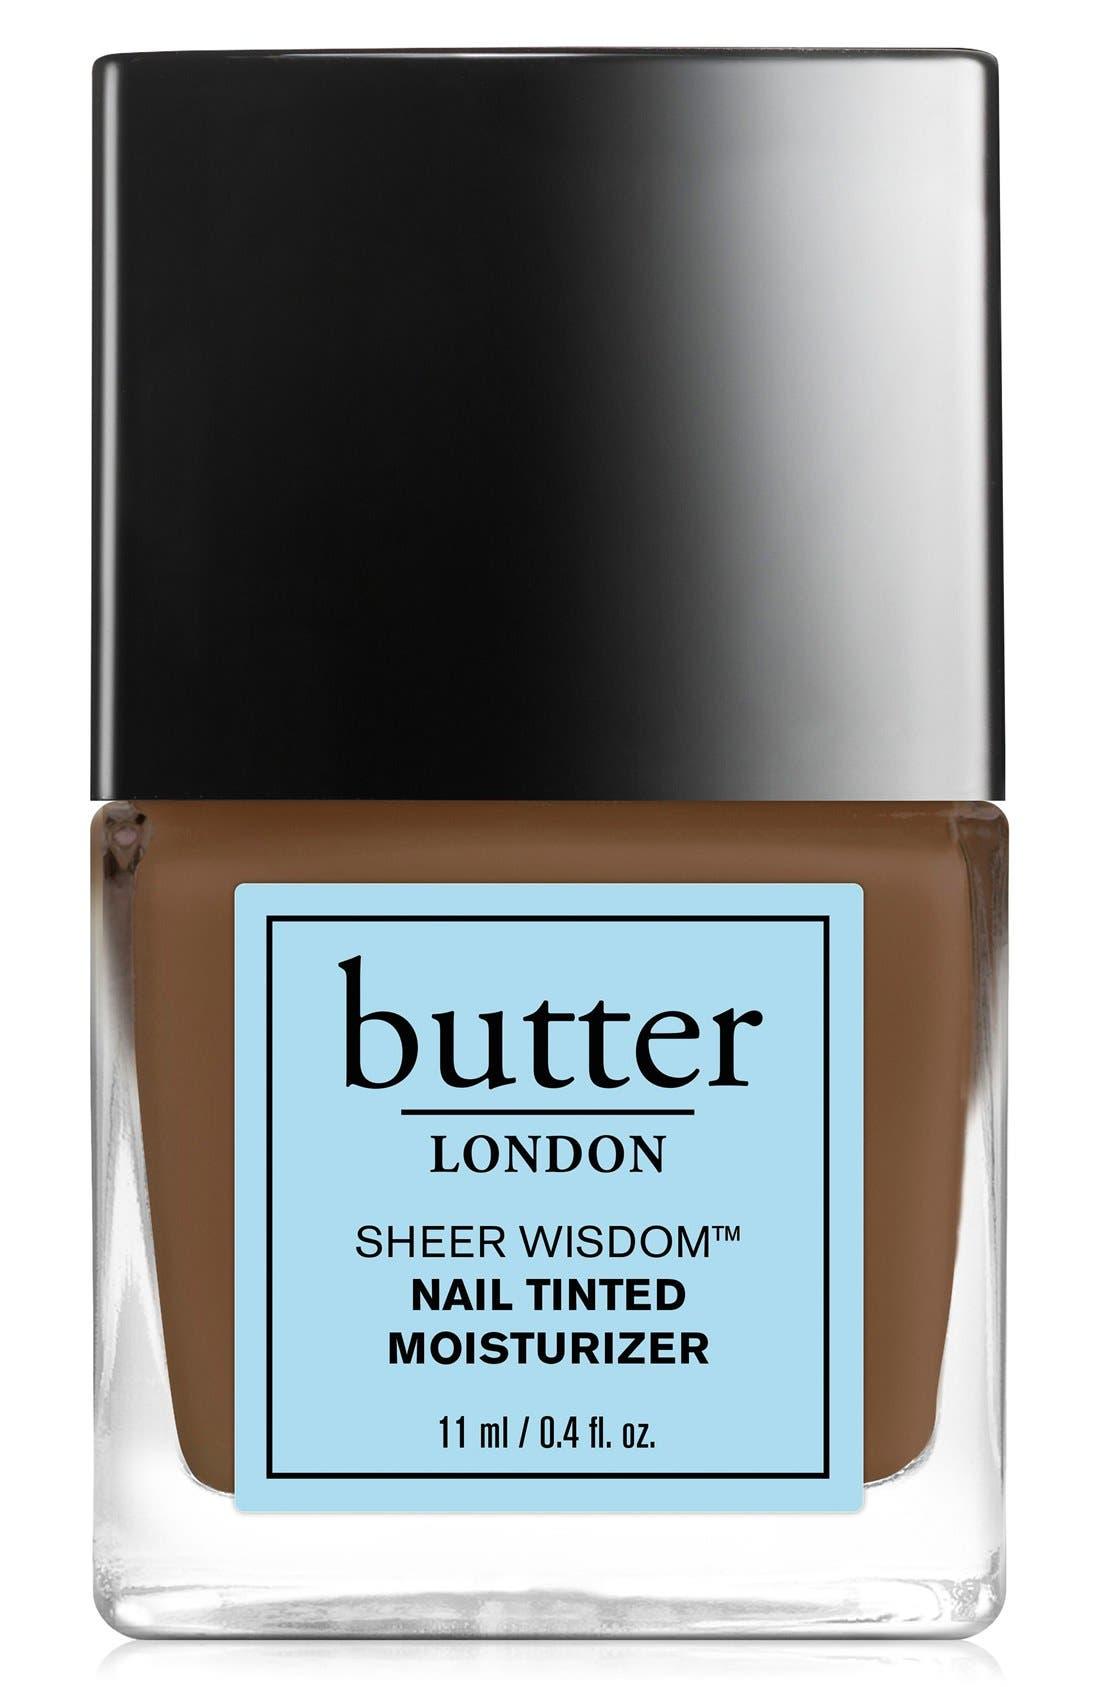 butter LONDON 'Sheer Wisdom™' Nail Tinted Moisturizer